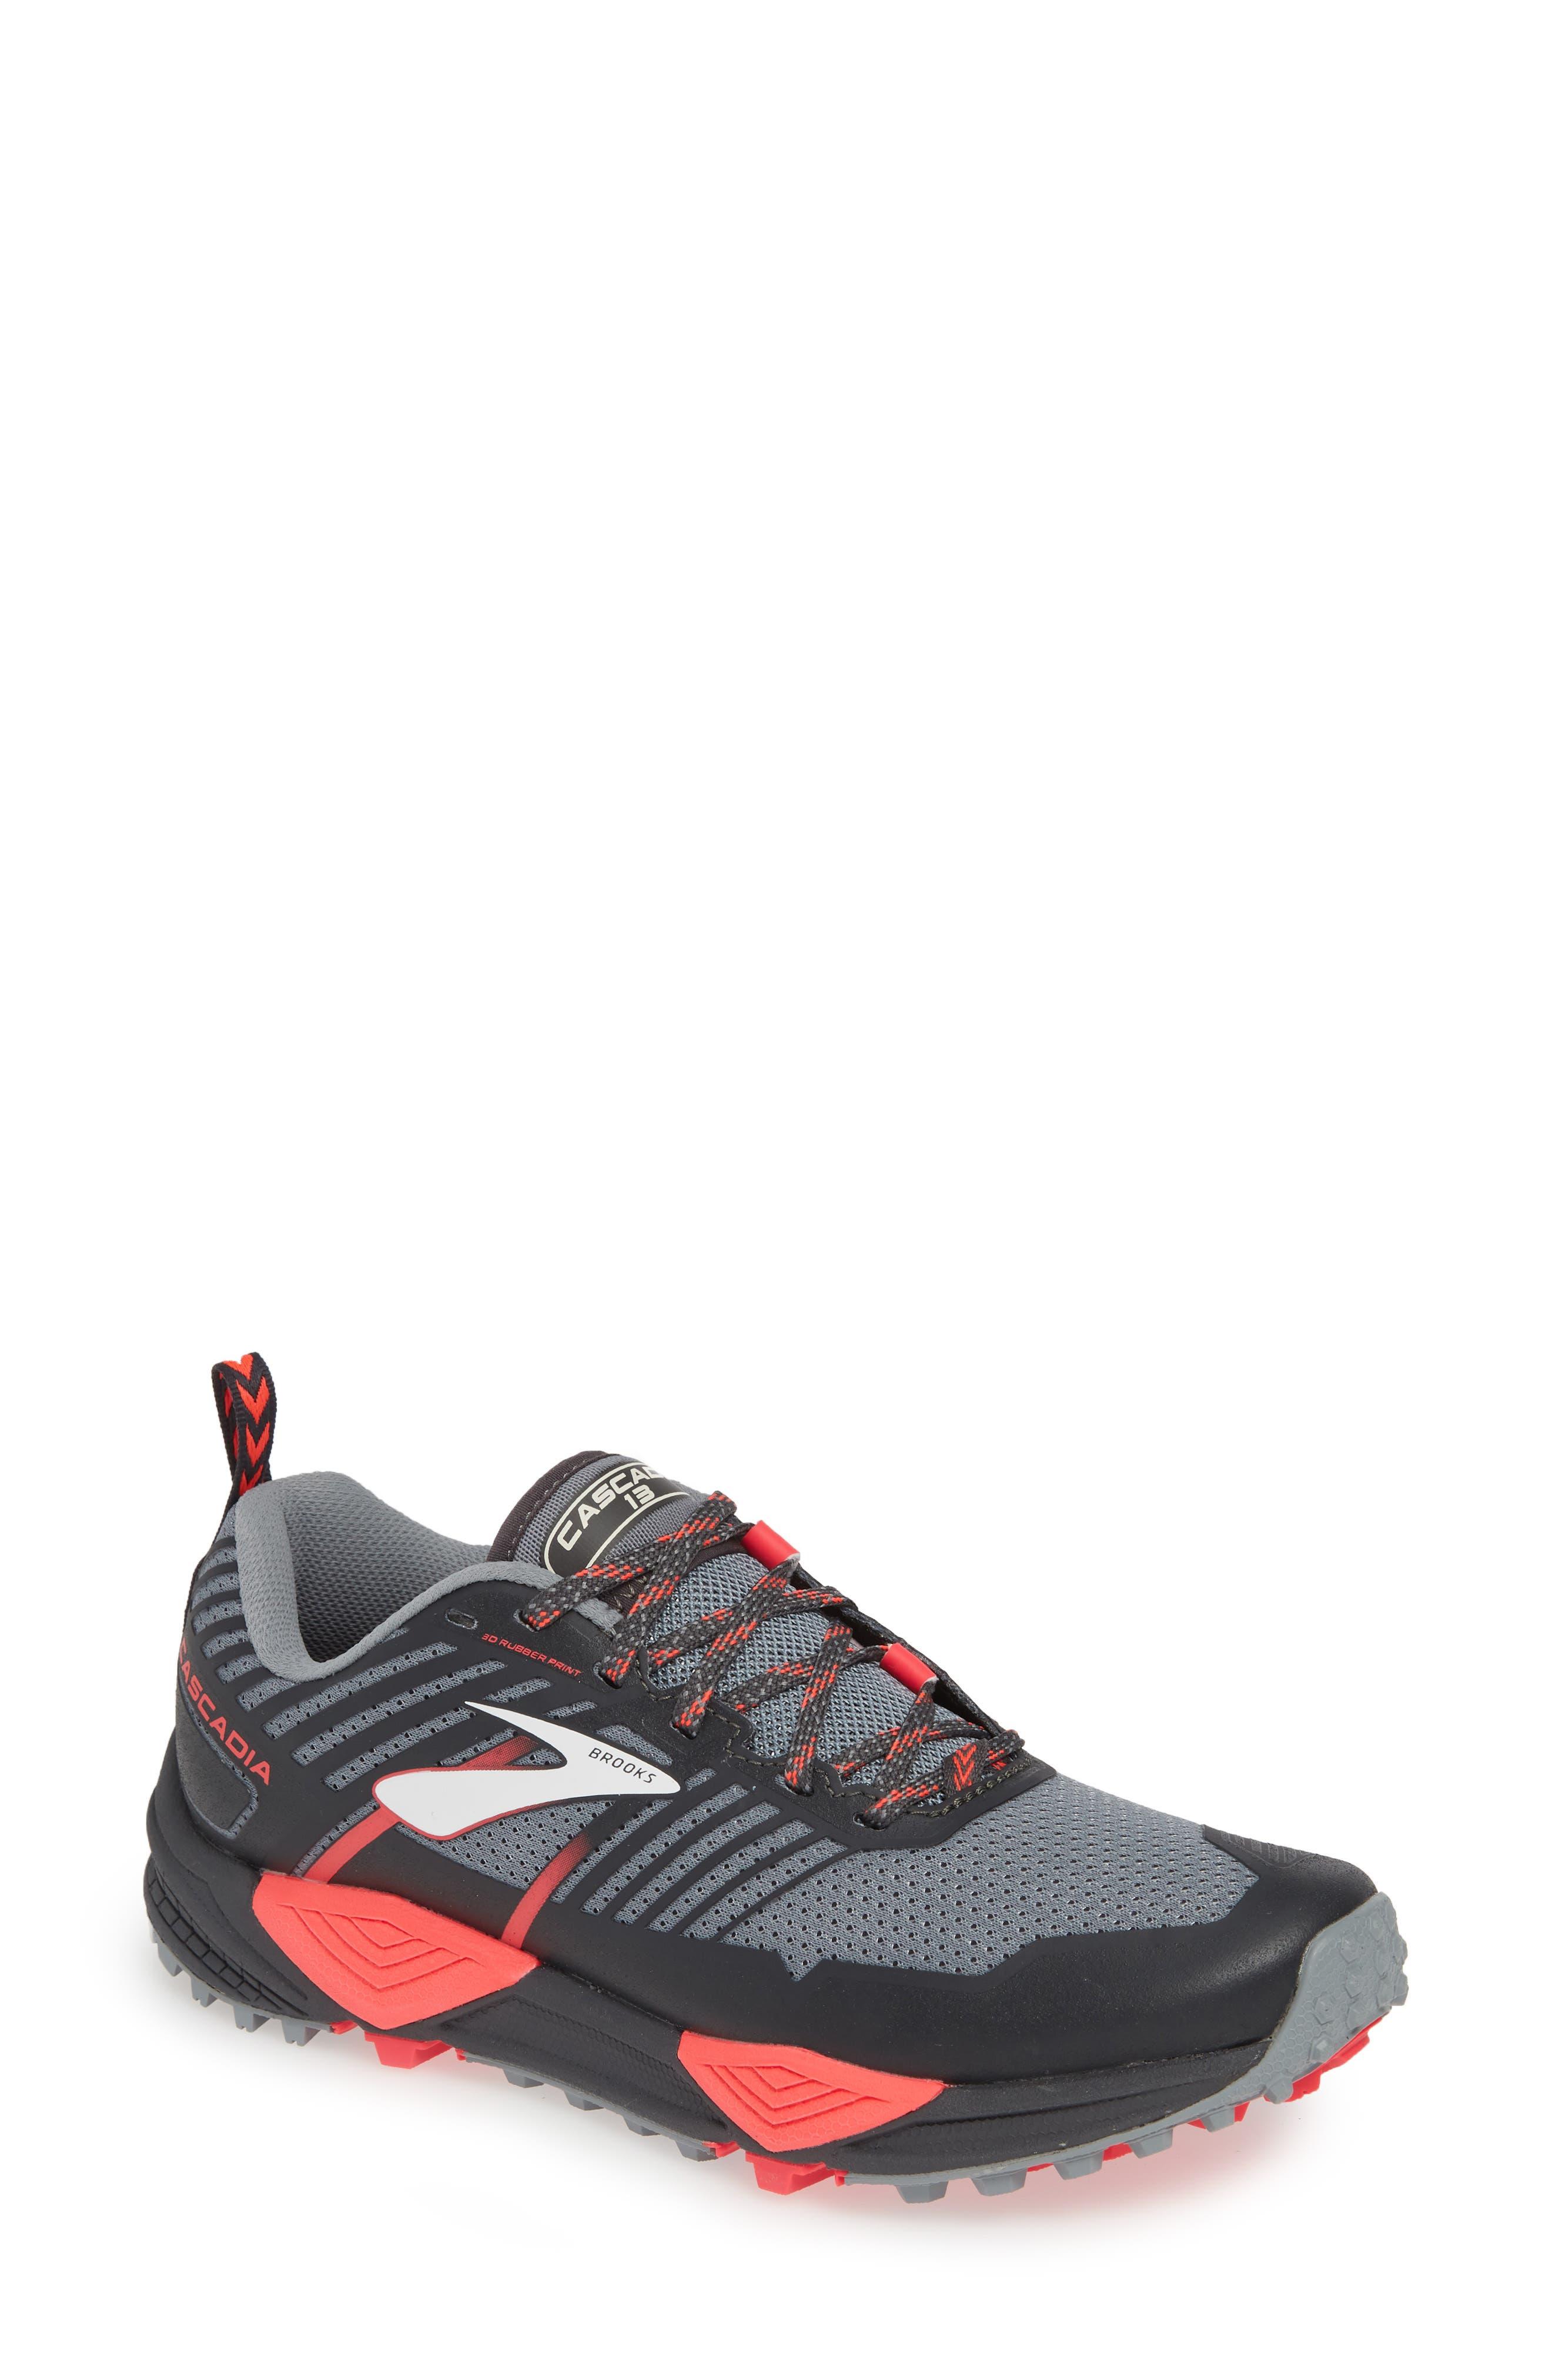 Brooks Cascadia 13 Trail Running Shoe B - Grey